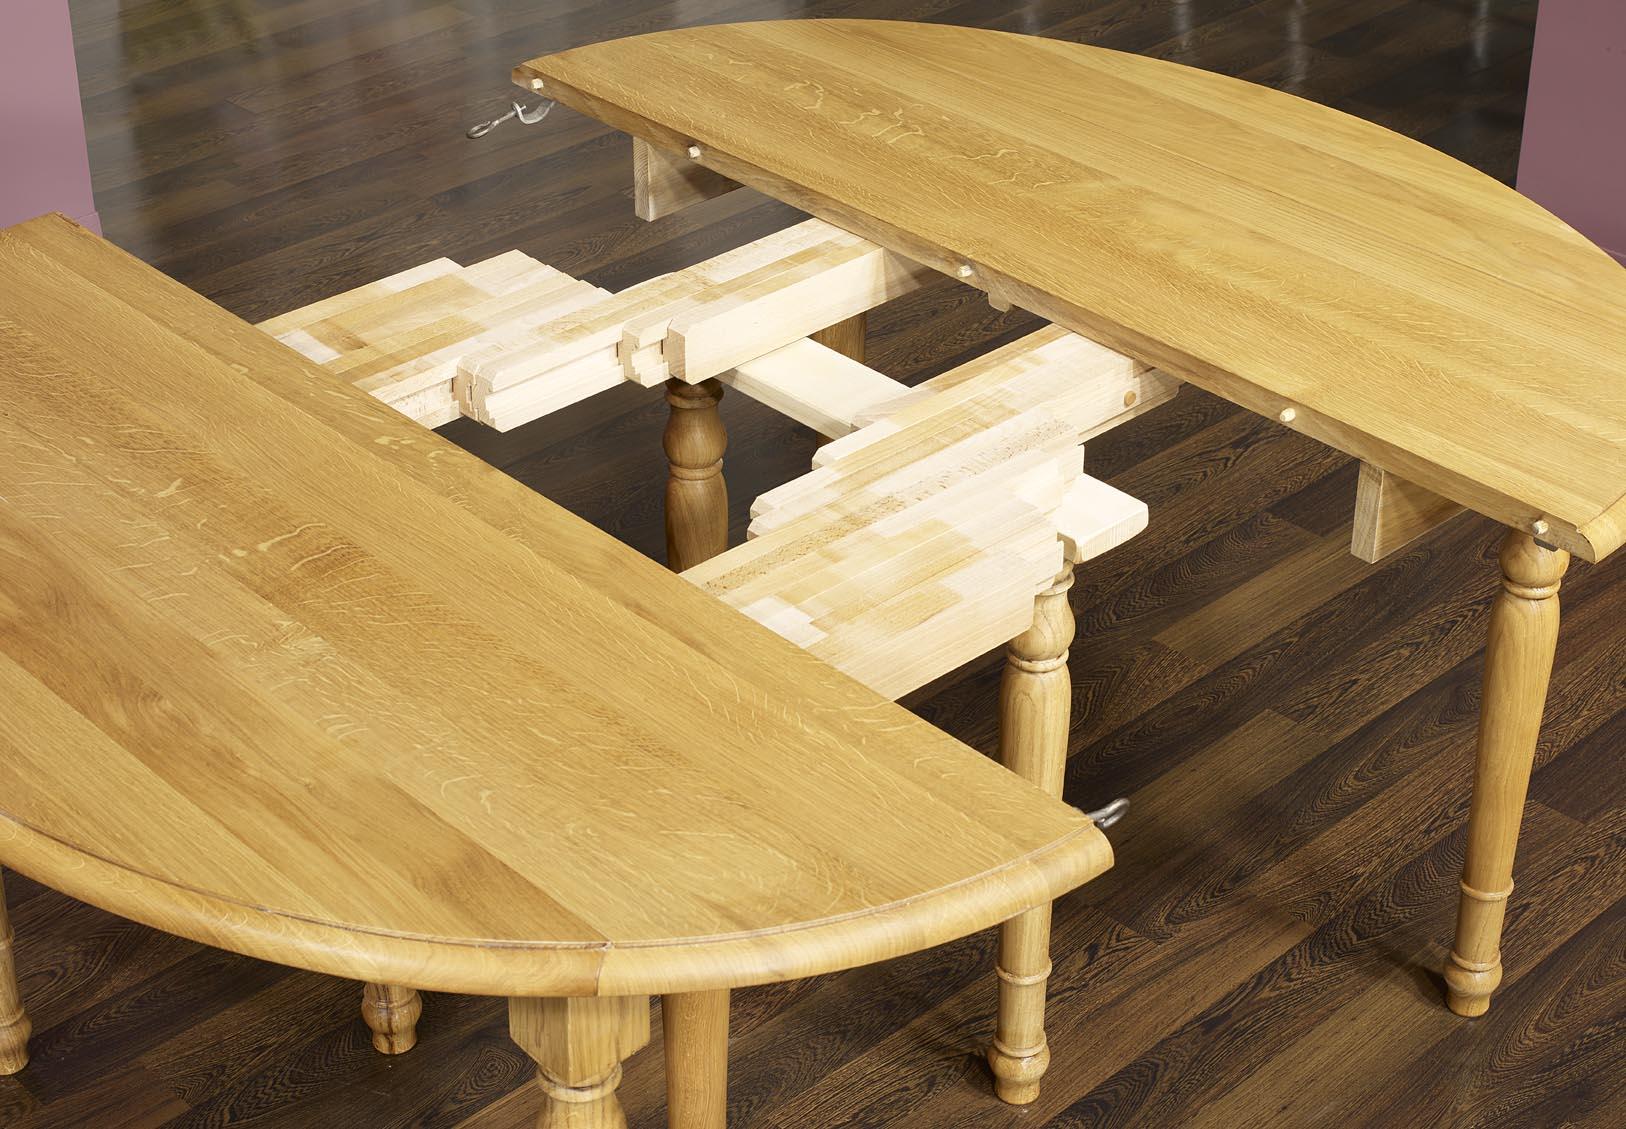 Table ovale volets 135x110 en ch ne massif de style for Table ovale chene massif